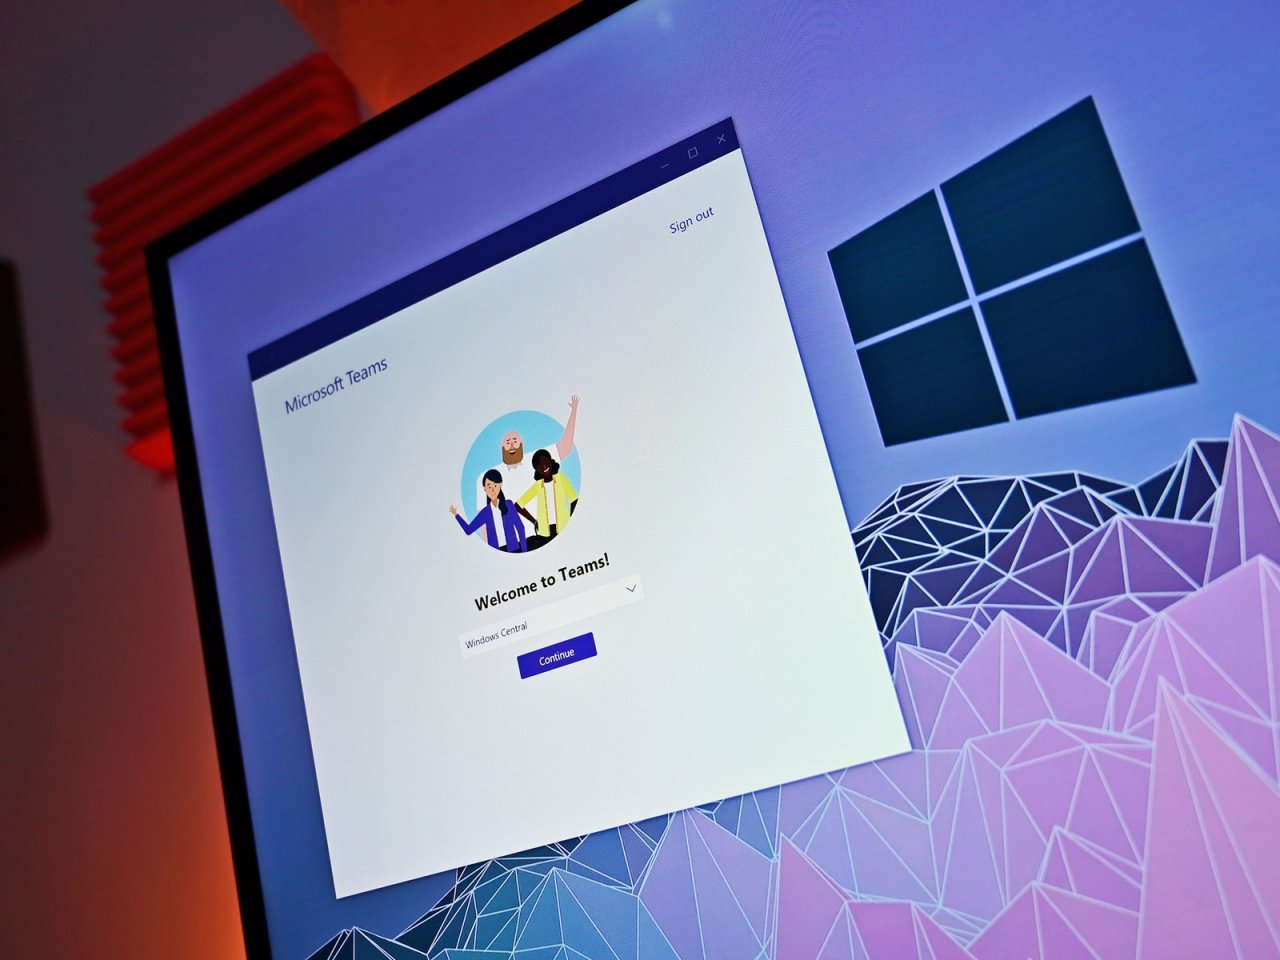 Microsoft разрабатывает новую версию Teams для Windows 10 на базе WebView2